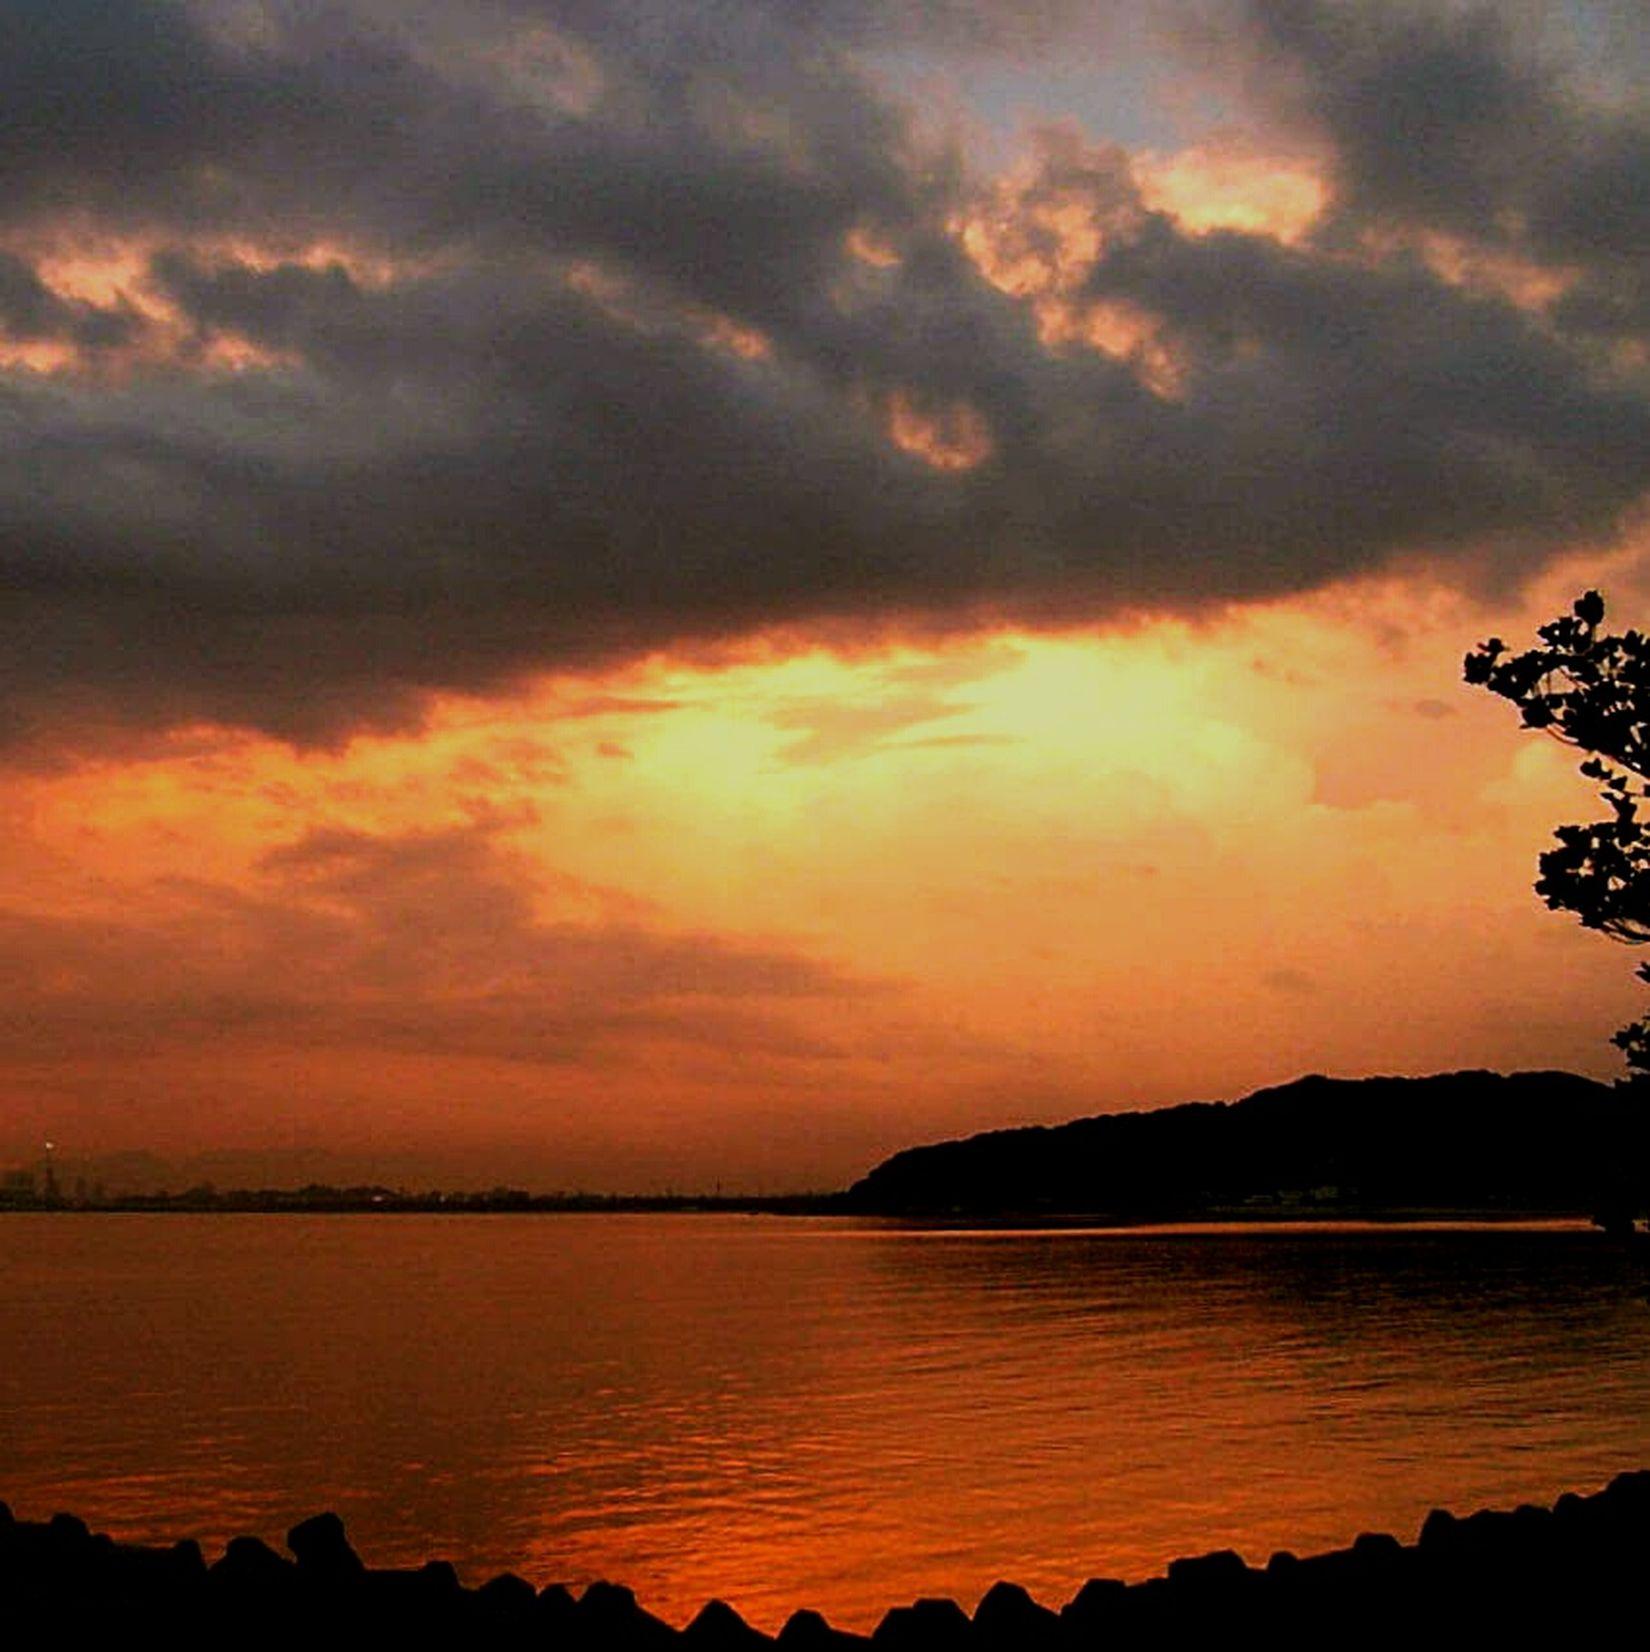 SillhouetteofFukuoka City  ImajukuBay Sunrise 2006 from my kitchen window. Phoneography Cellphone Photography